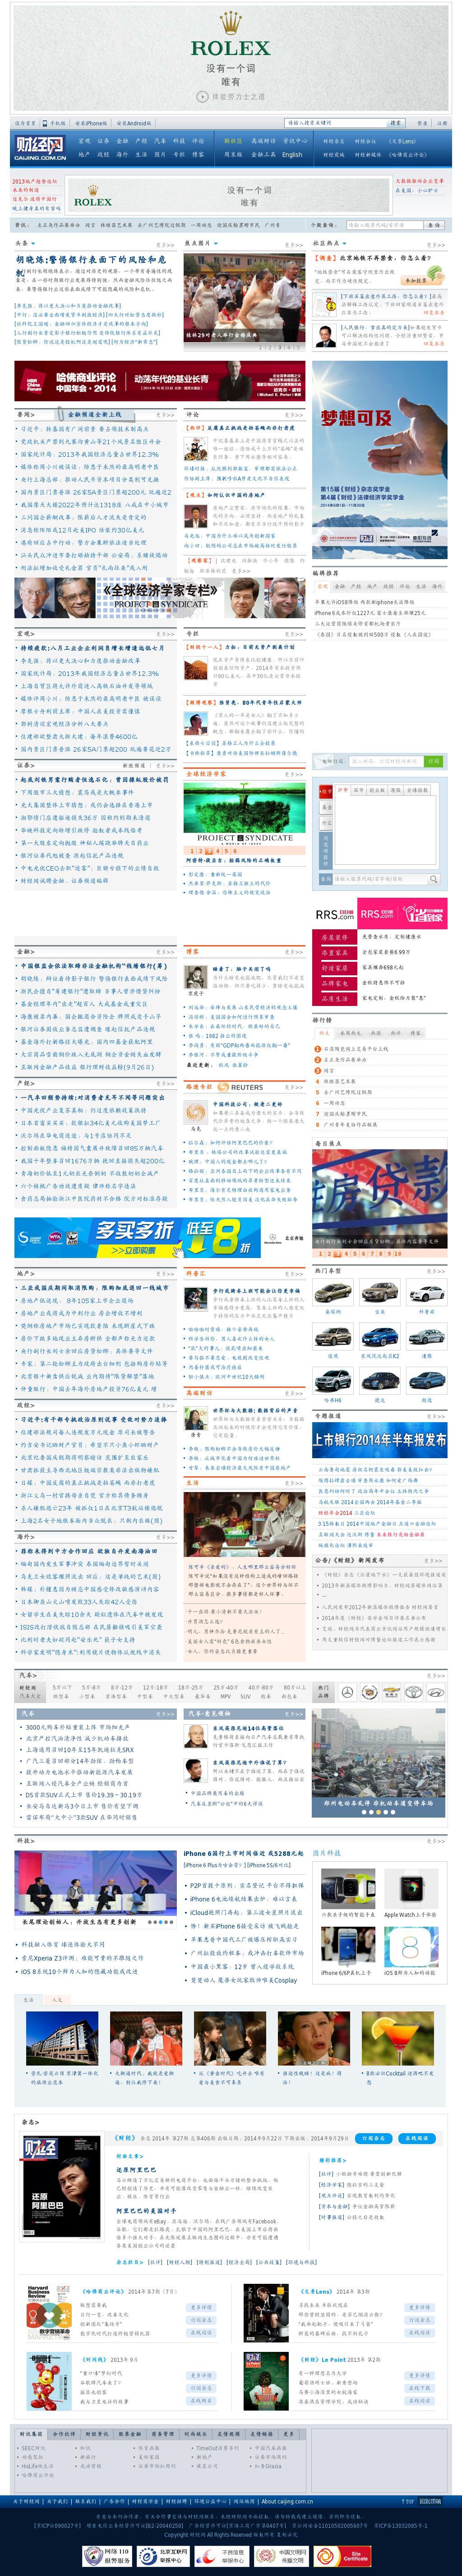 Caijing at Sunday Sept. 28, 2014, 11:01 p.m. UTC